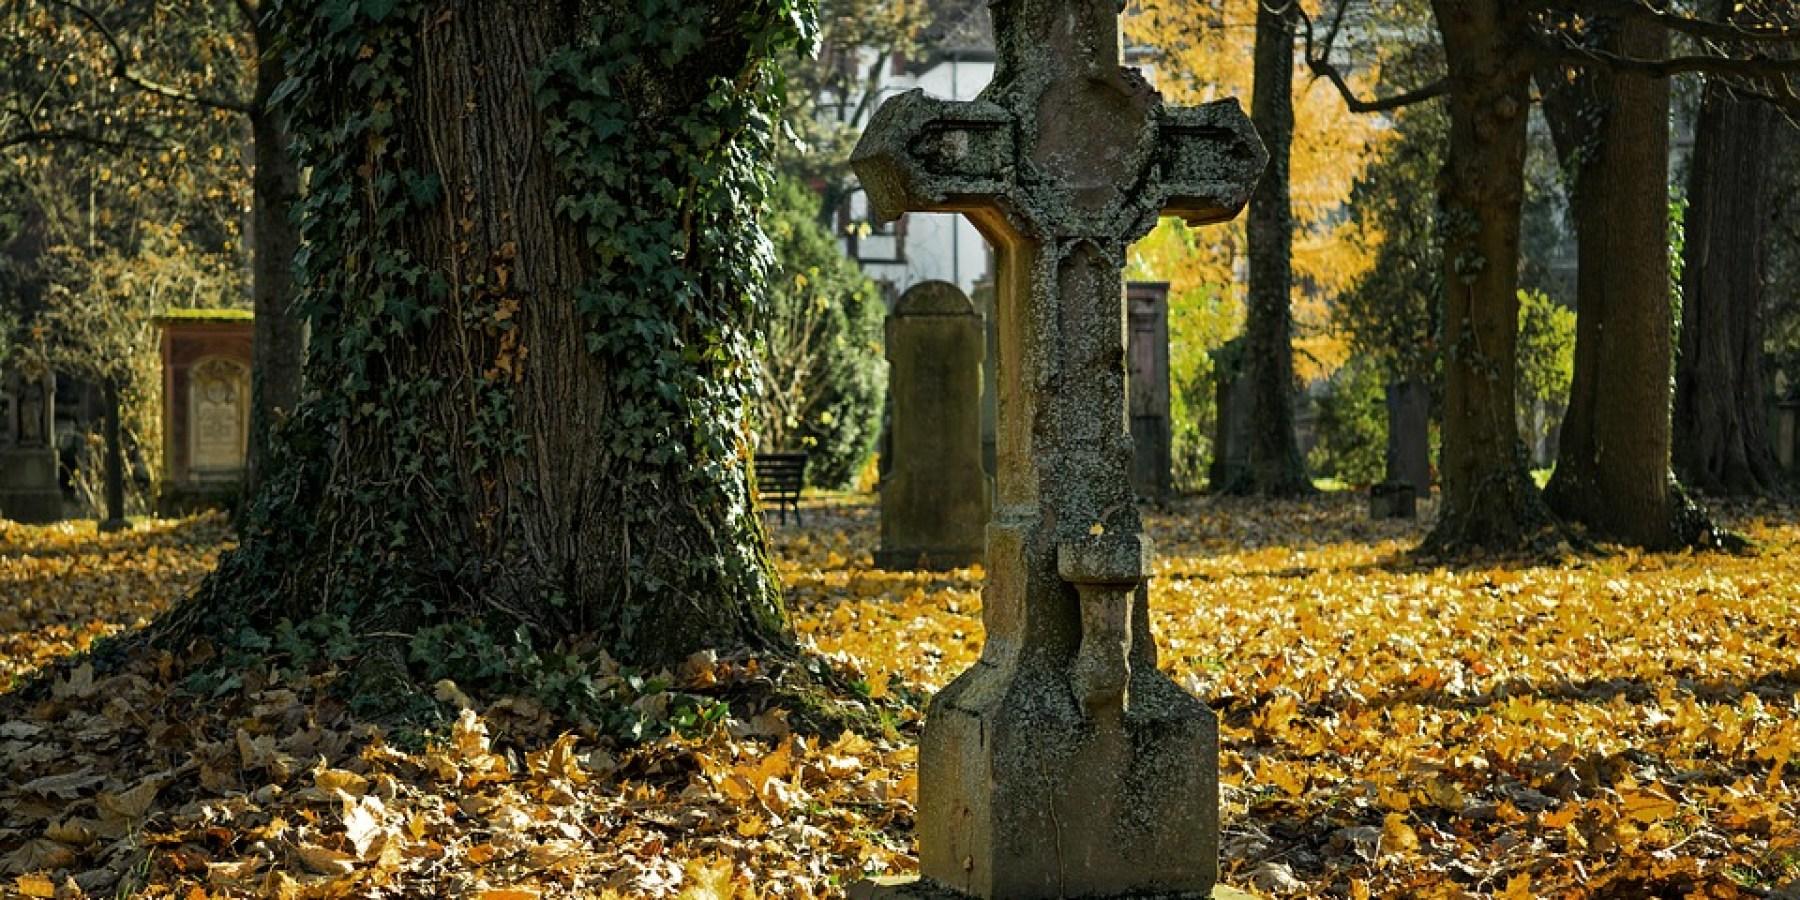 Informativer Spaziergang über den Waldfriedhof Lauheide